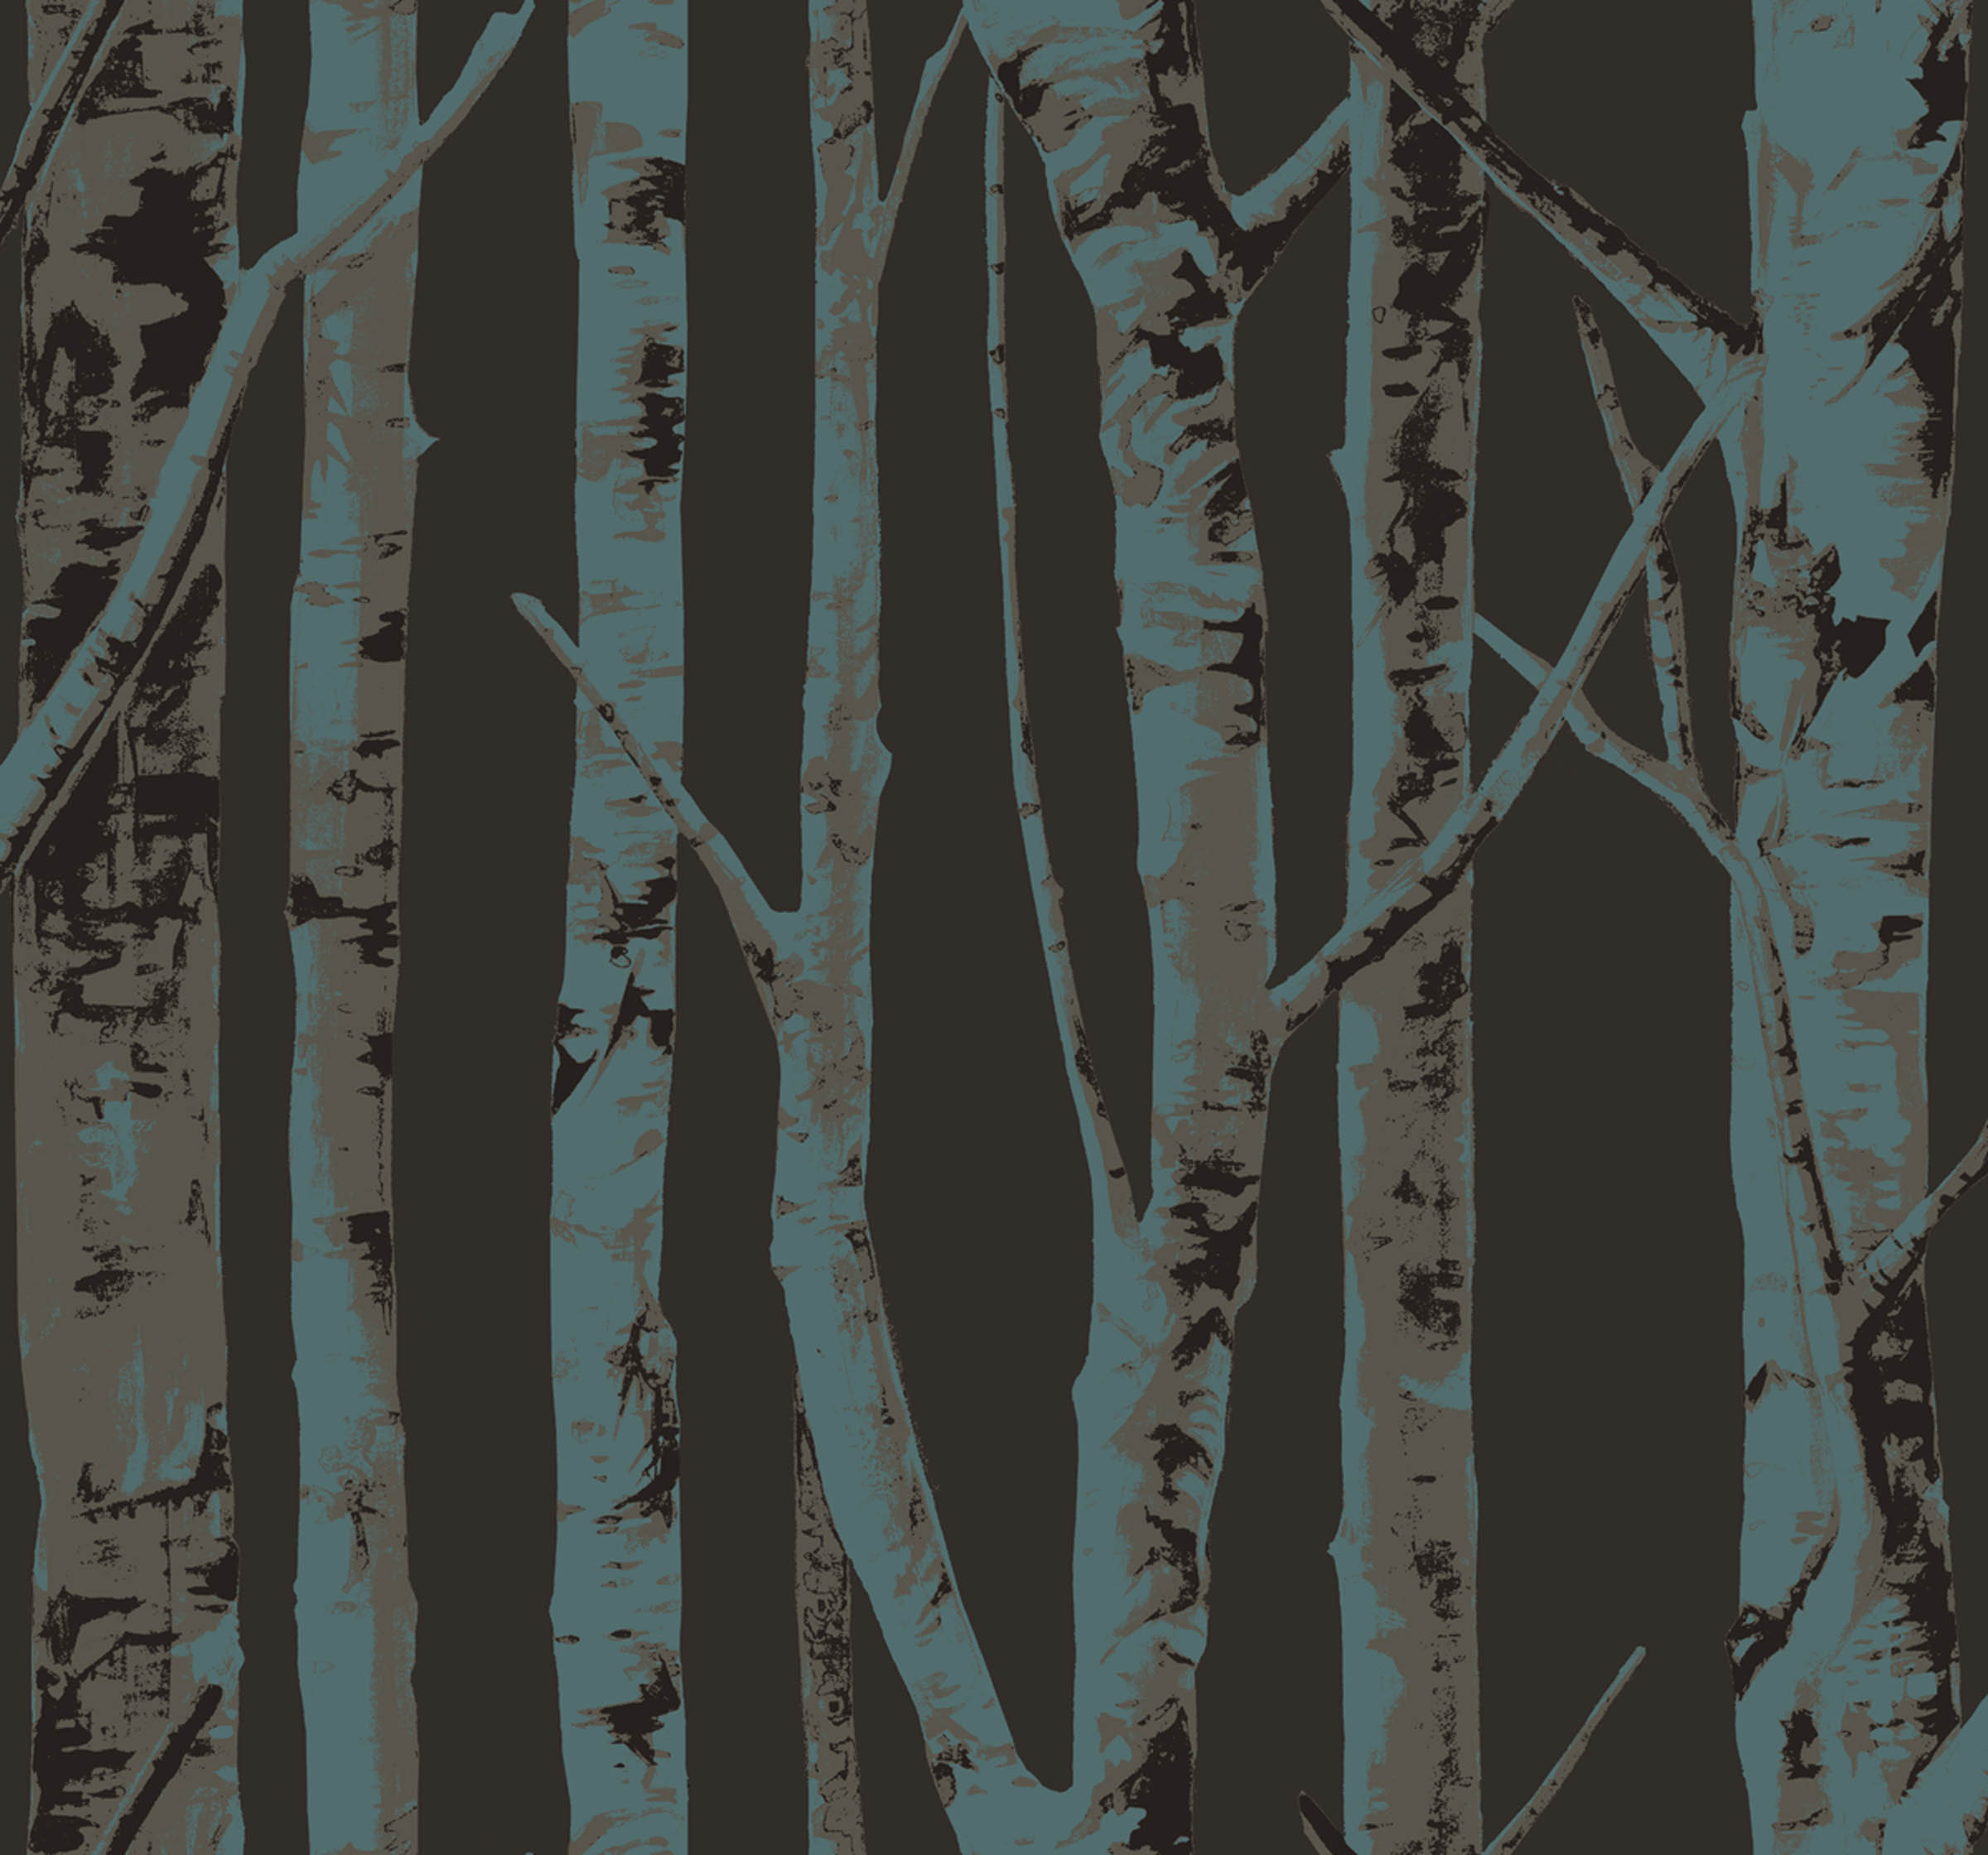 incredible birch tree wall - photo #42